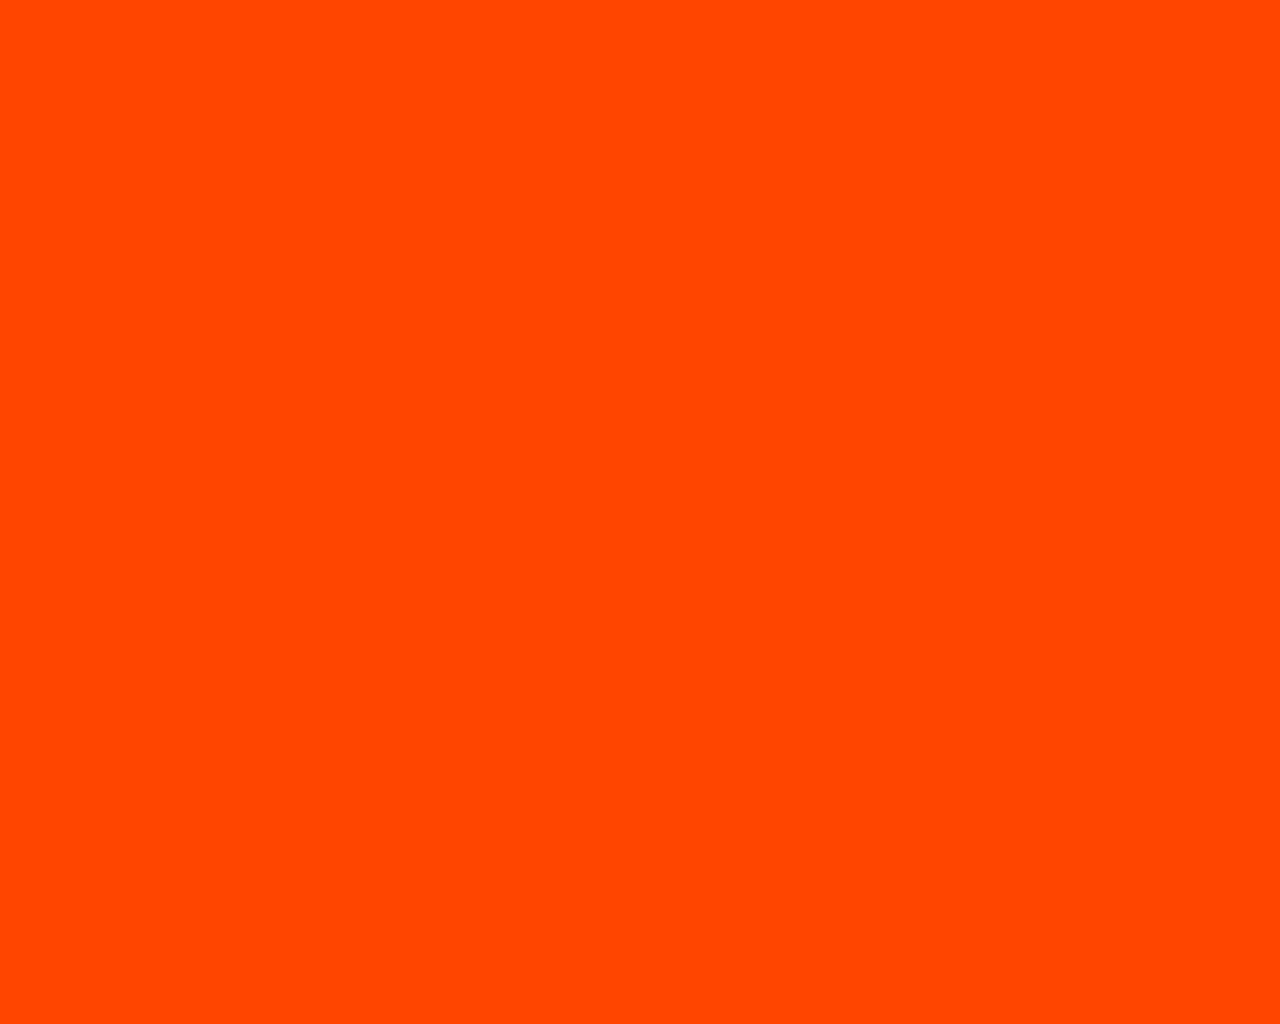 1280x1024 Orange-red Solid Color Background